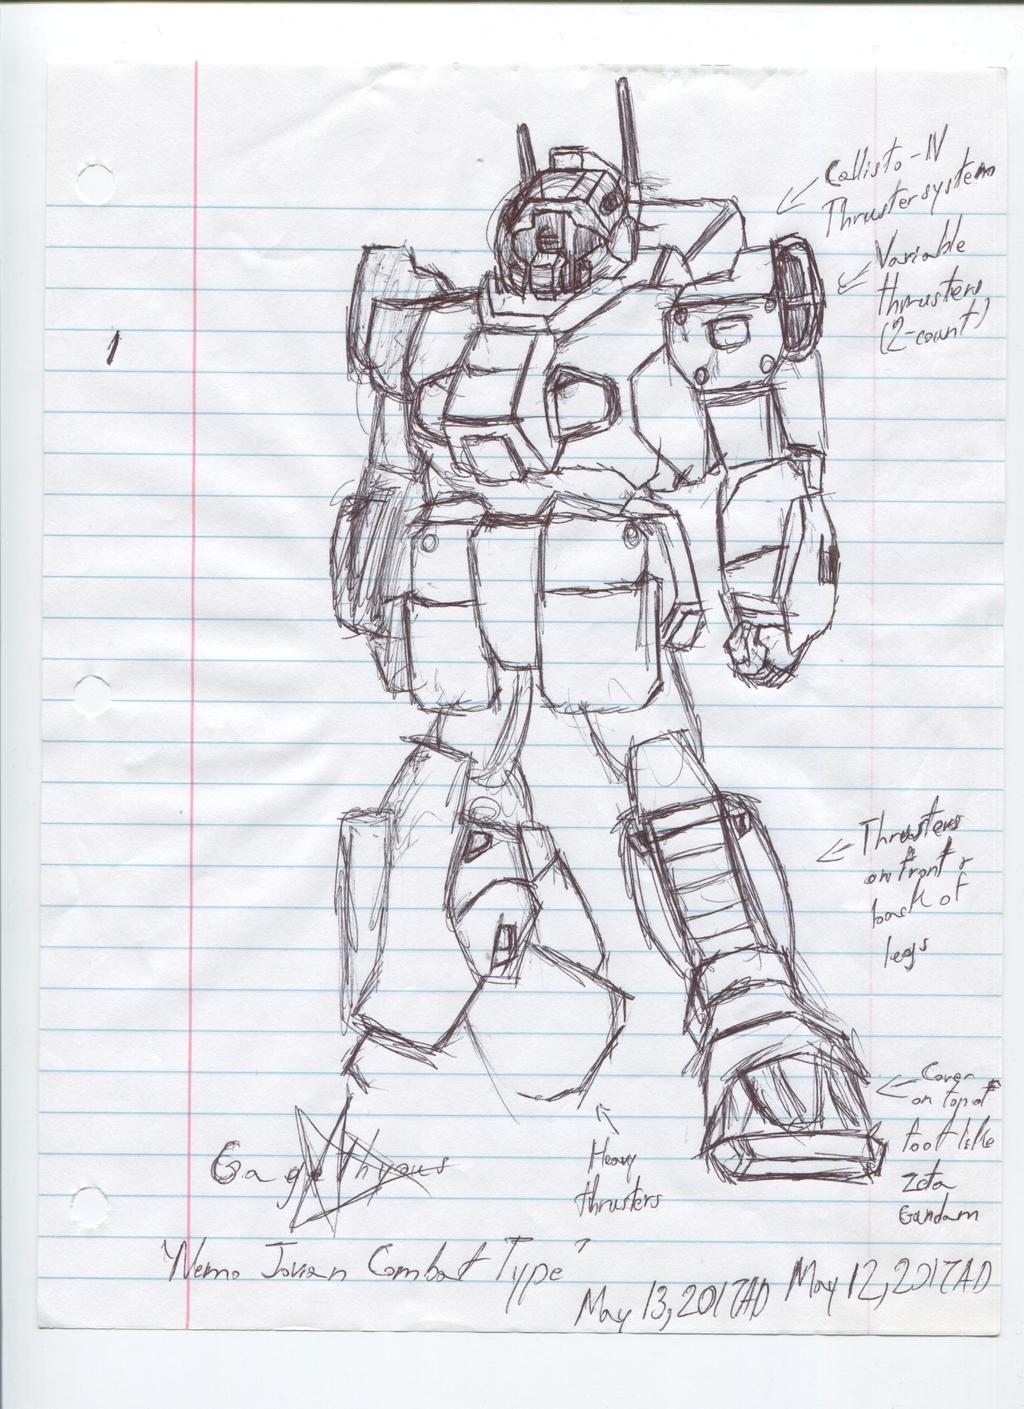 Gundam Project Thing: Nemo Jovian Combat Type Concept